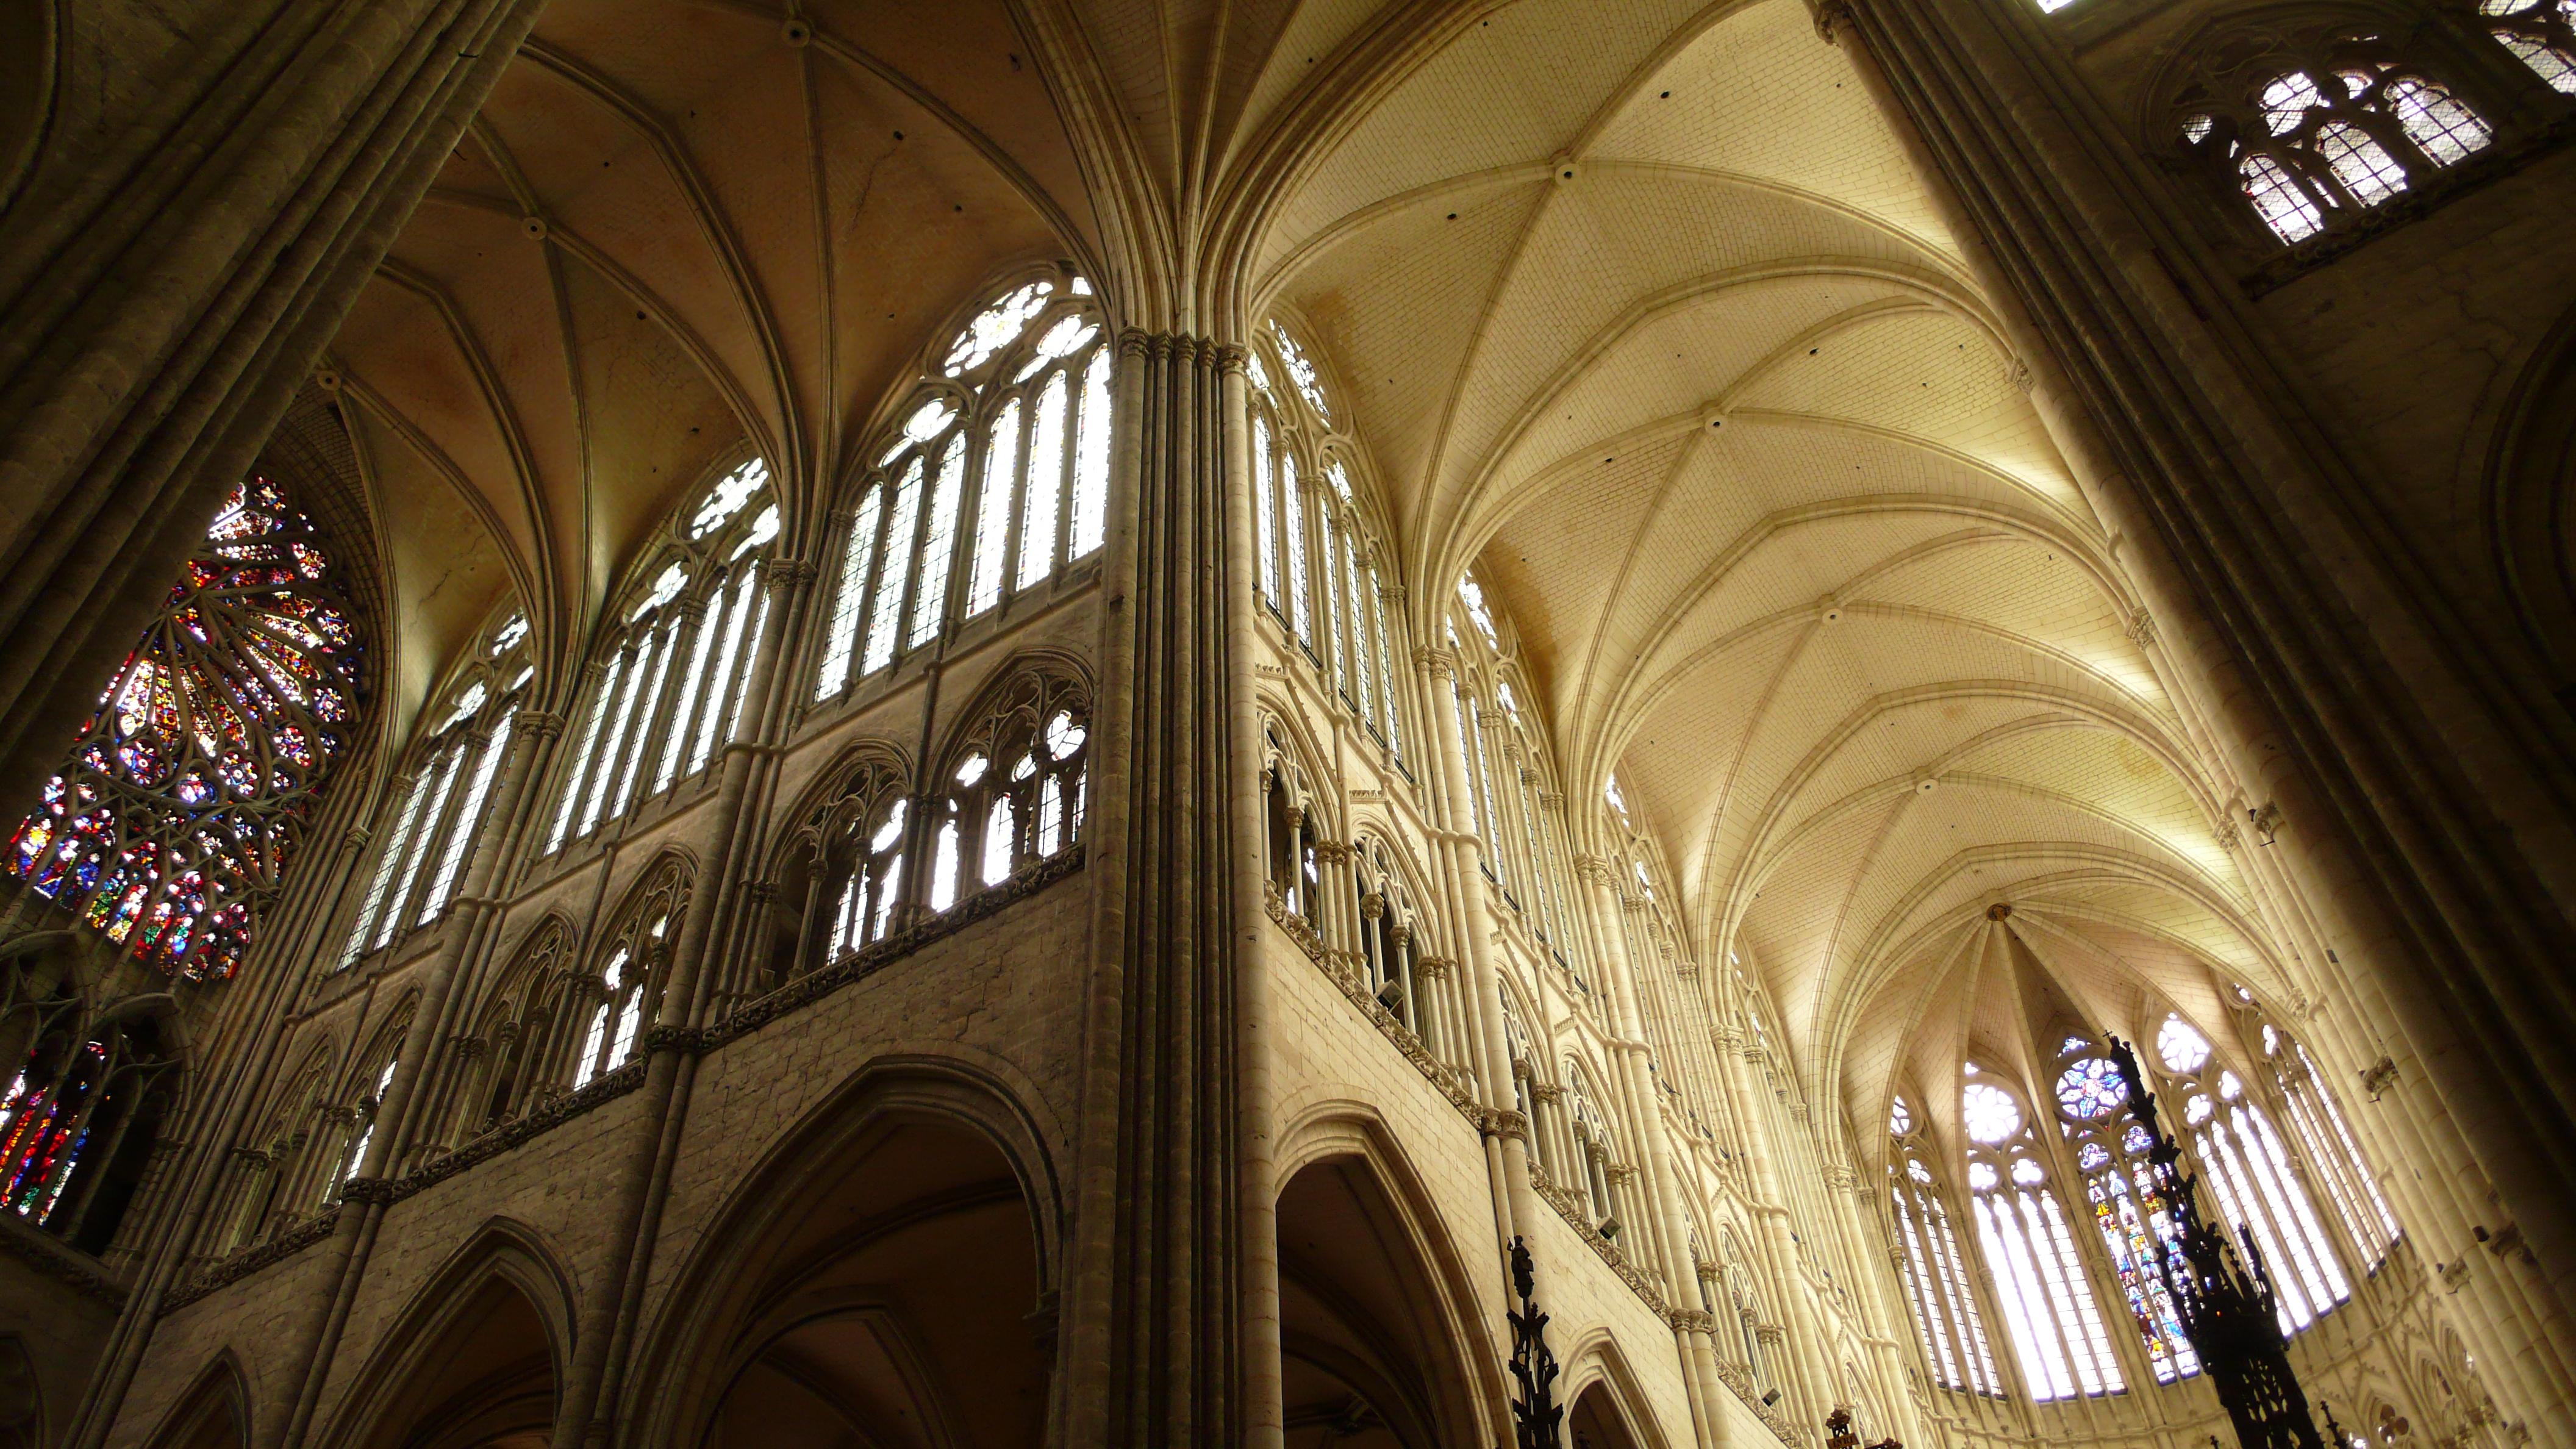 Sociales san mart n 2 arquitectura g tica estructura for Arquitectura gotica partes